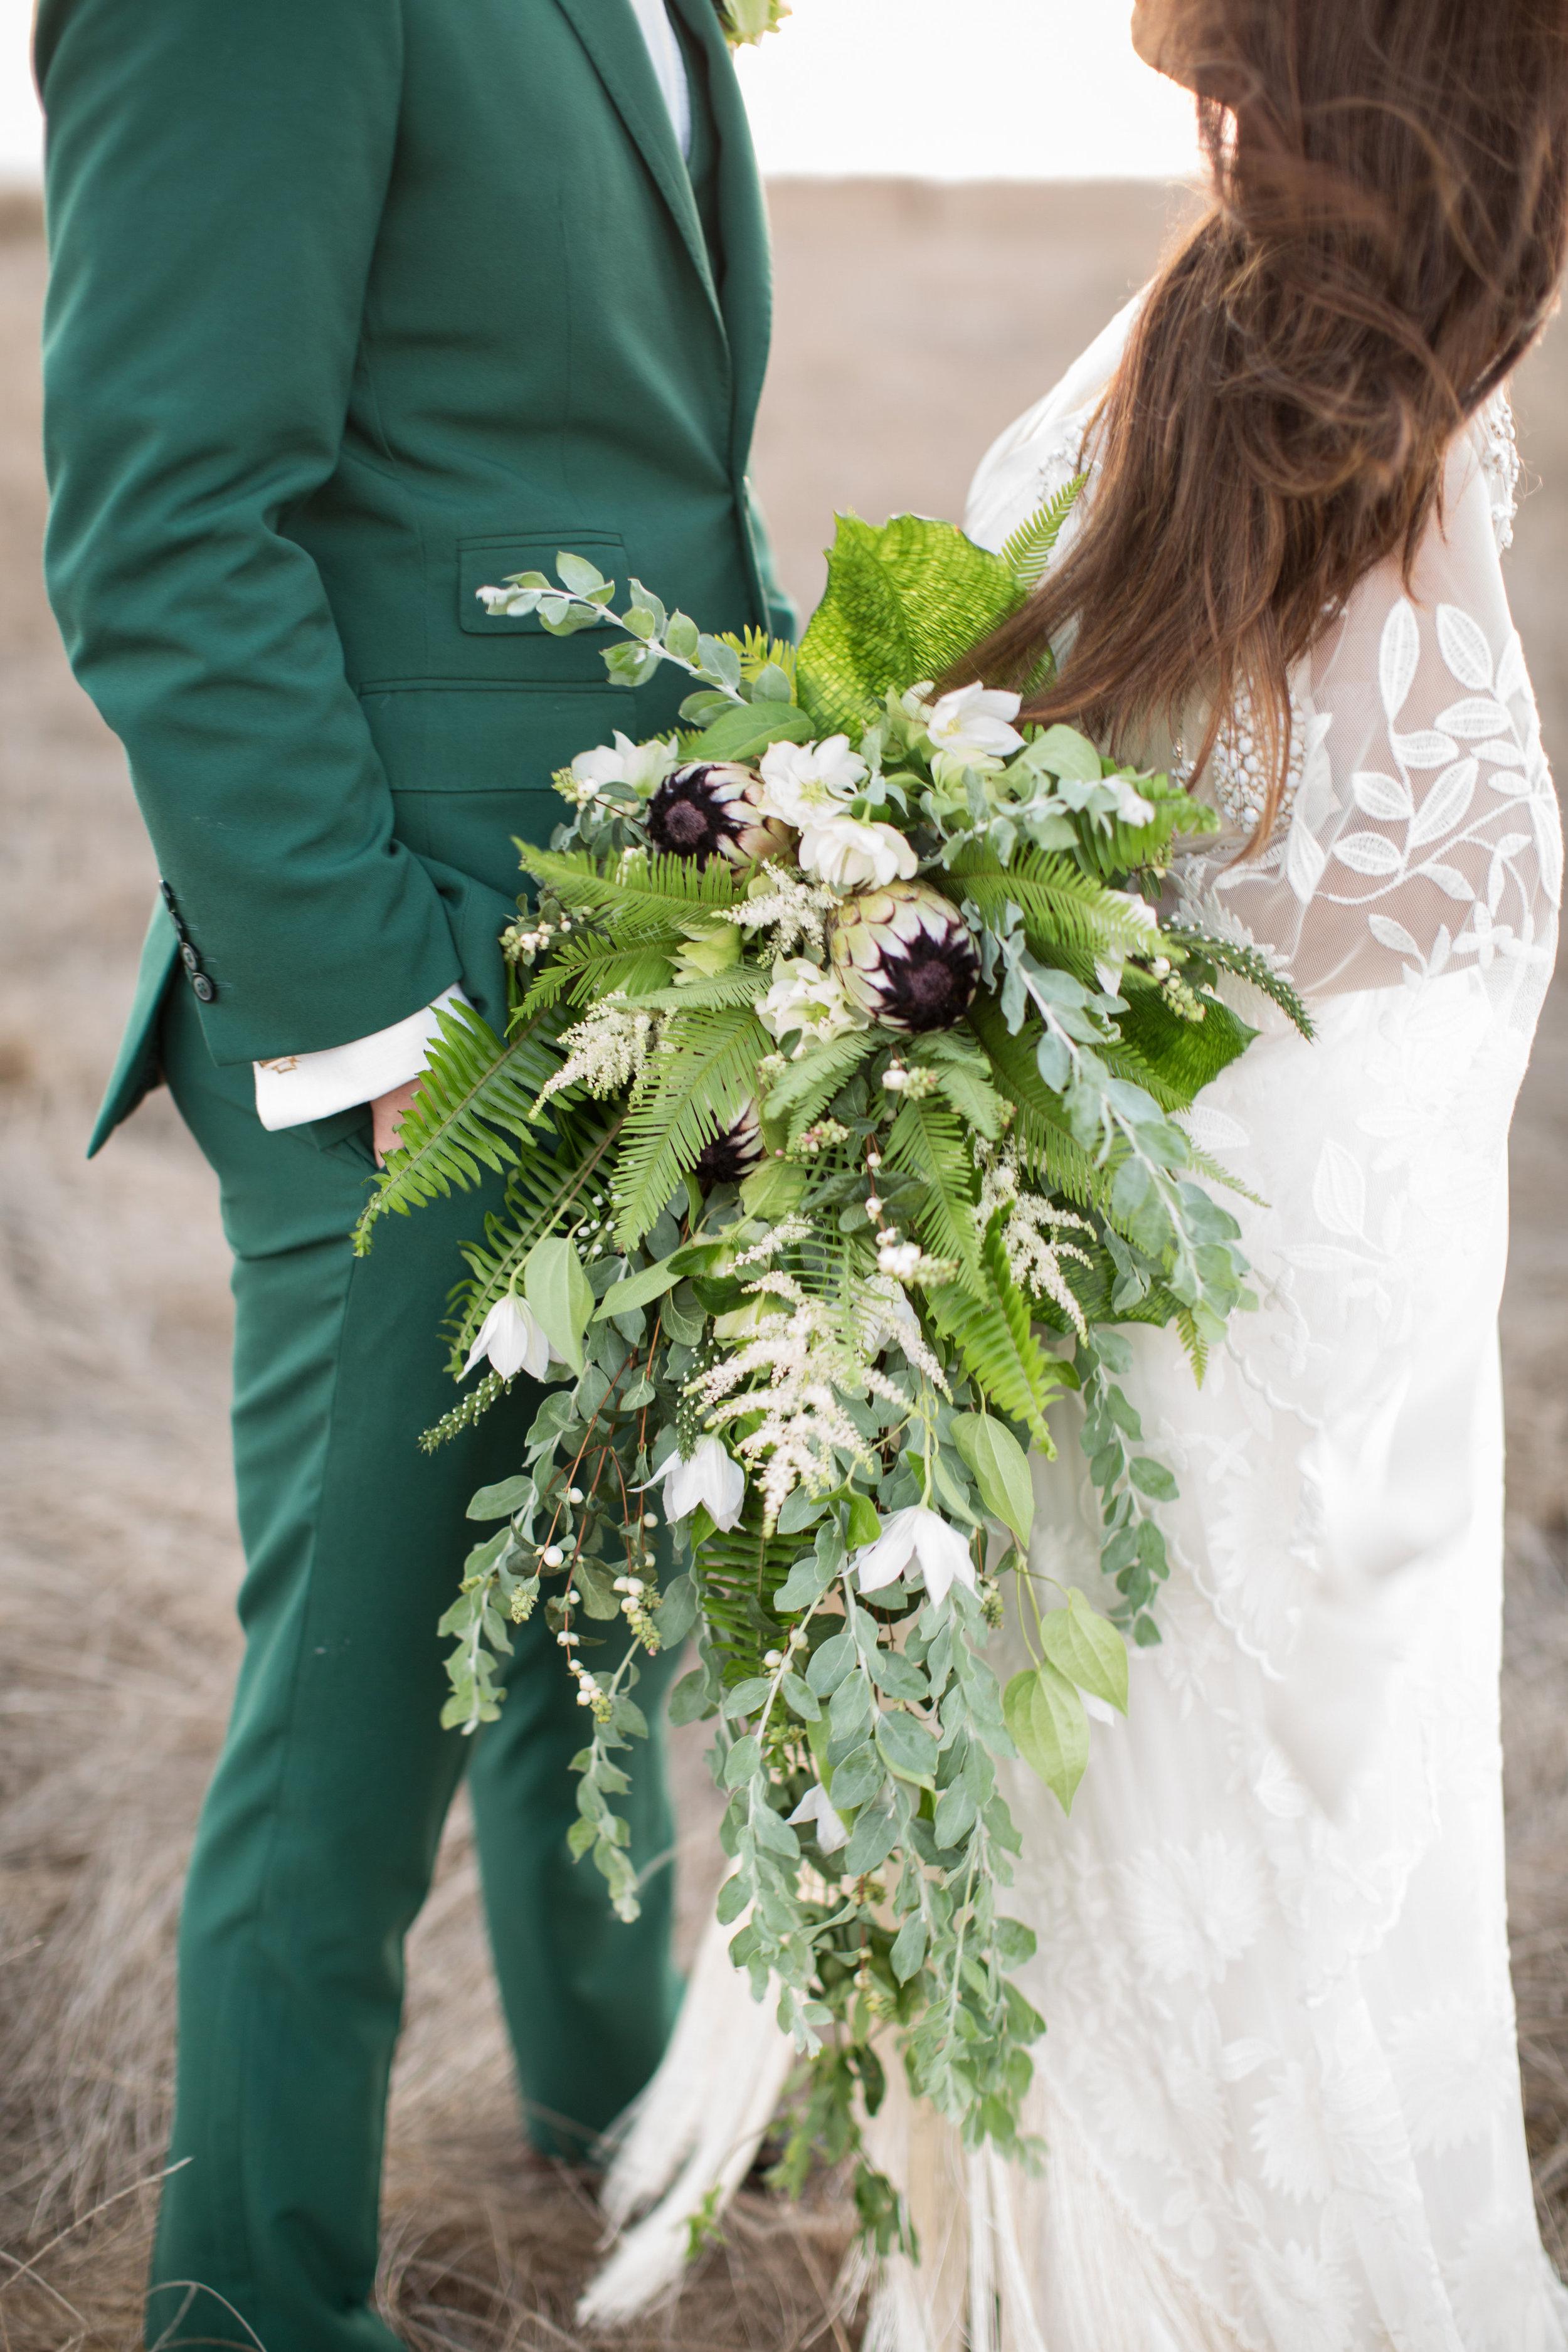 santa-barbara-elopement-elope-wedding-pop-up-coordinator-day-of-event-planning-planner-ellwood-bluff-eucalyptus-grove-rustic-ocean-view-front-hop-green-suit (1 (27).jpg